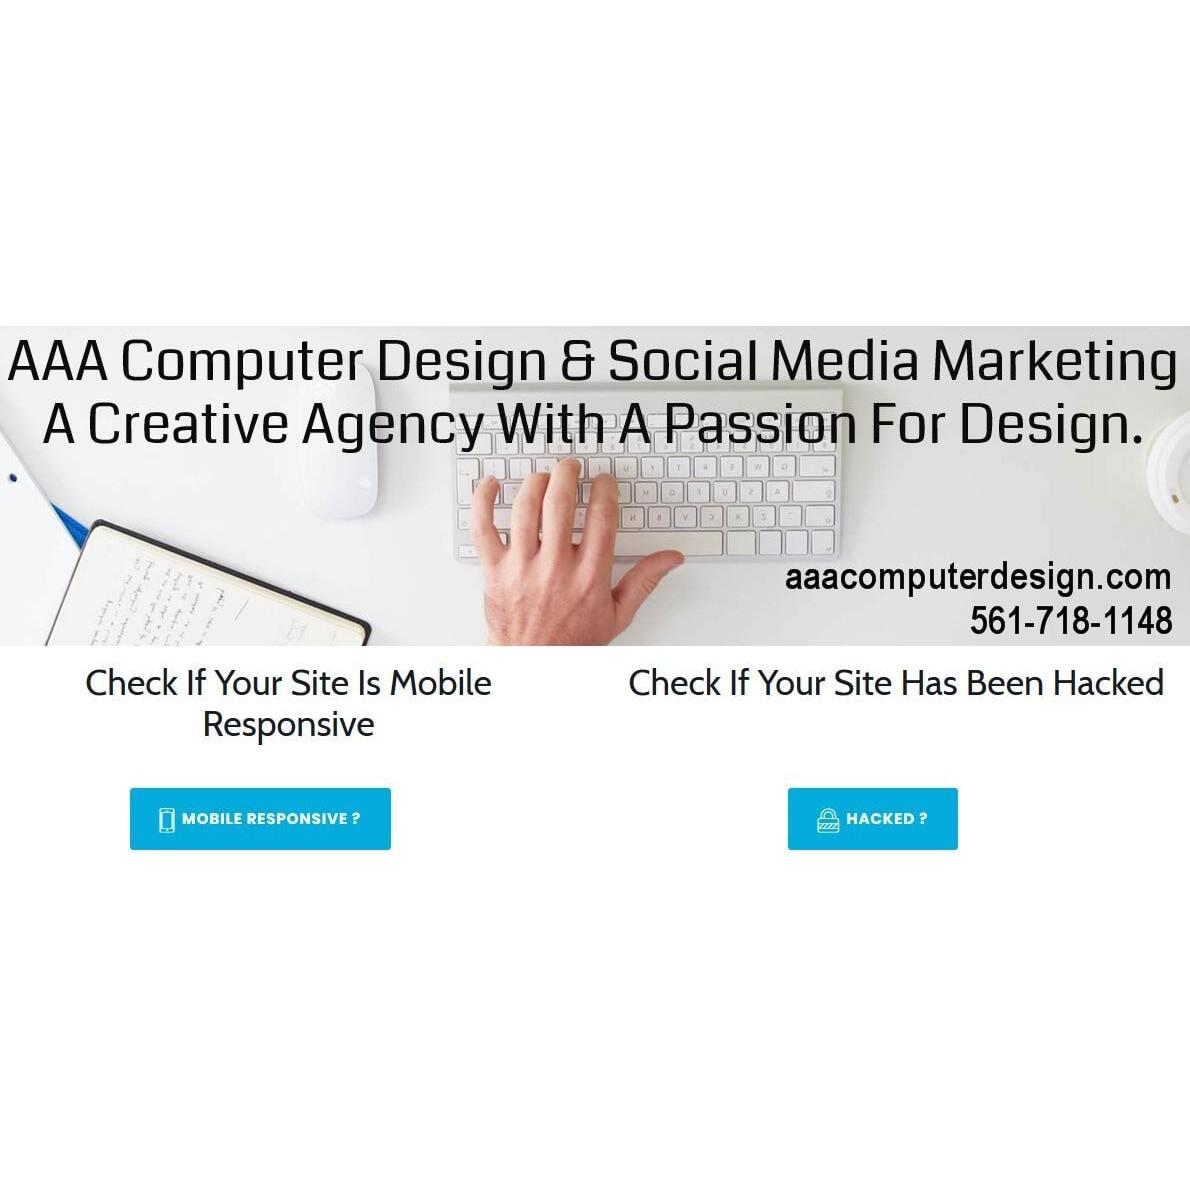 AAA Computer Design